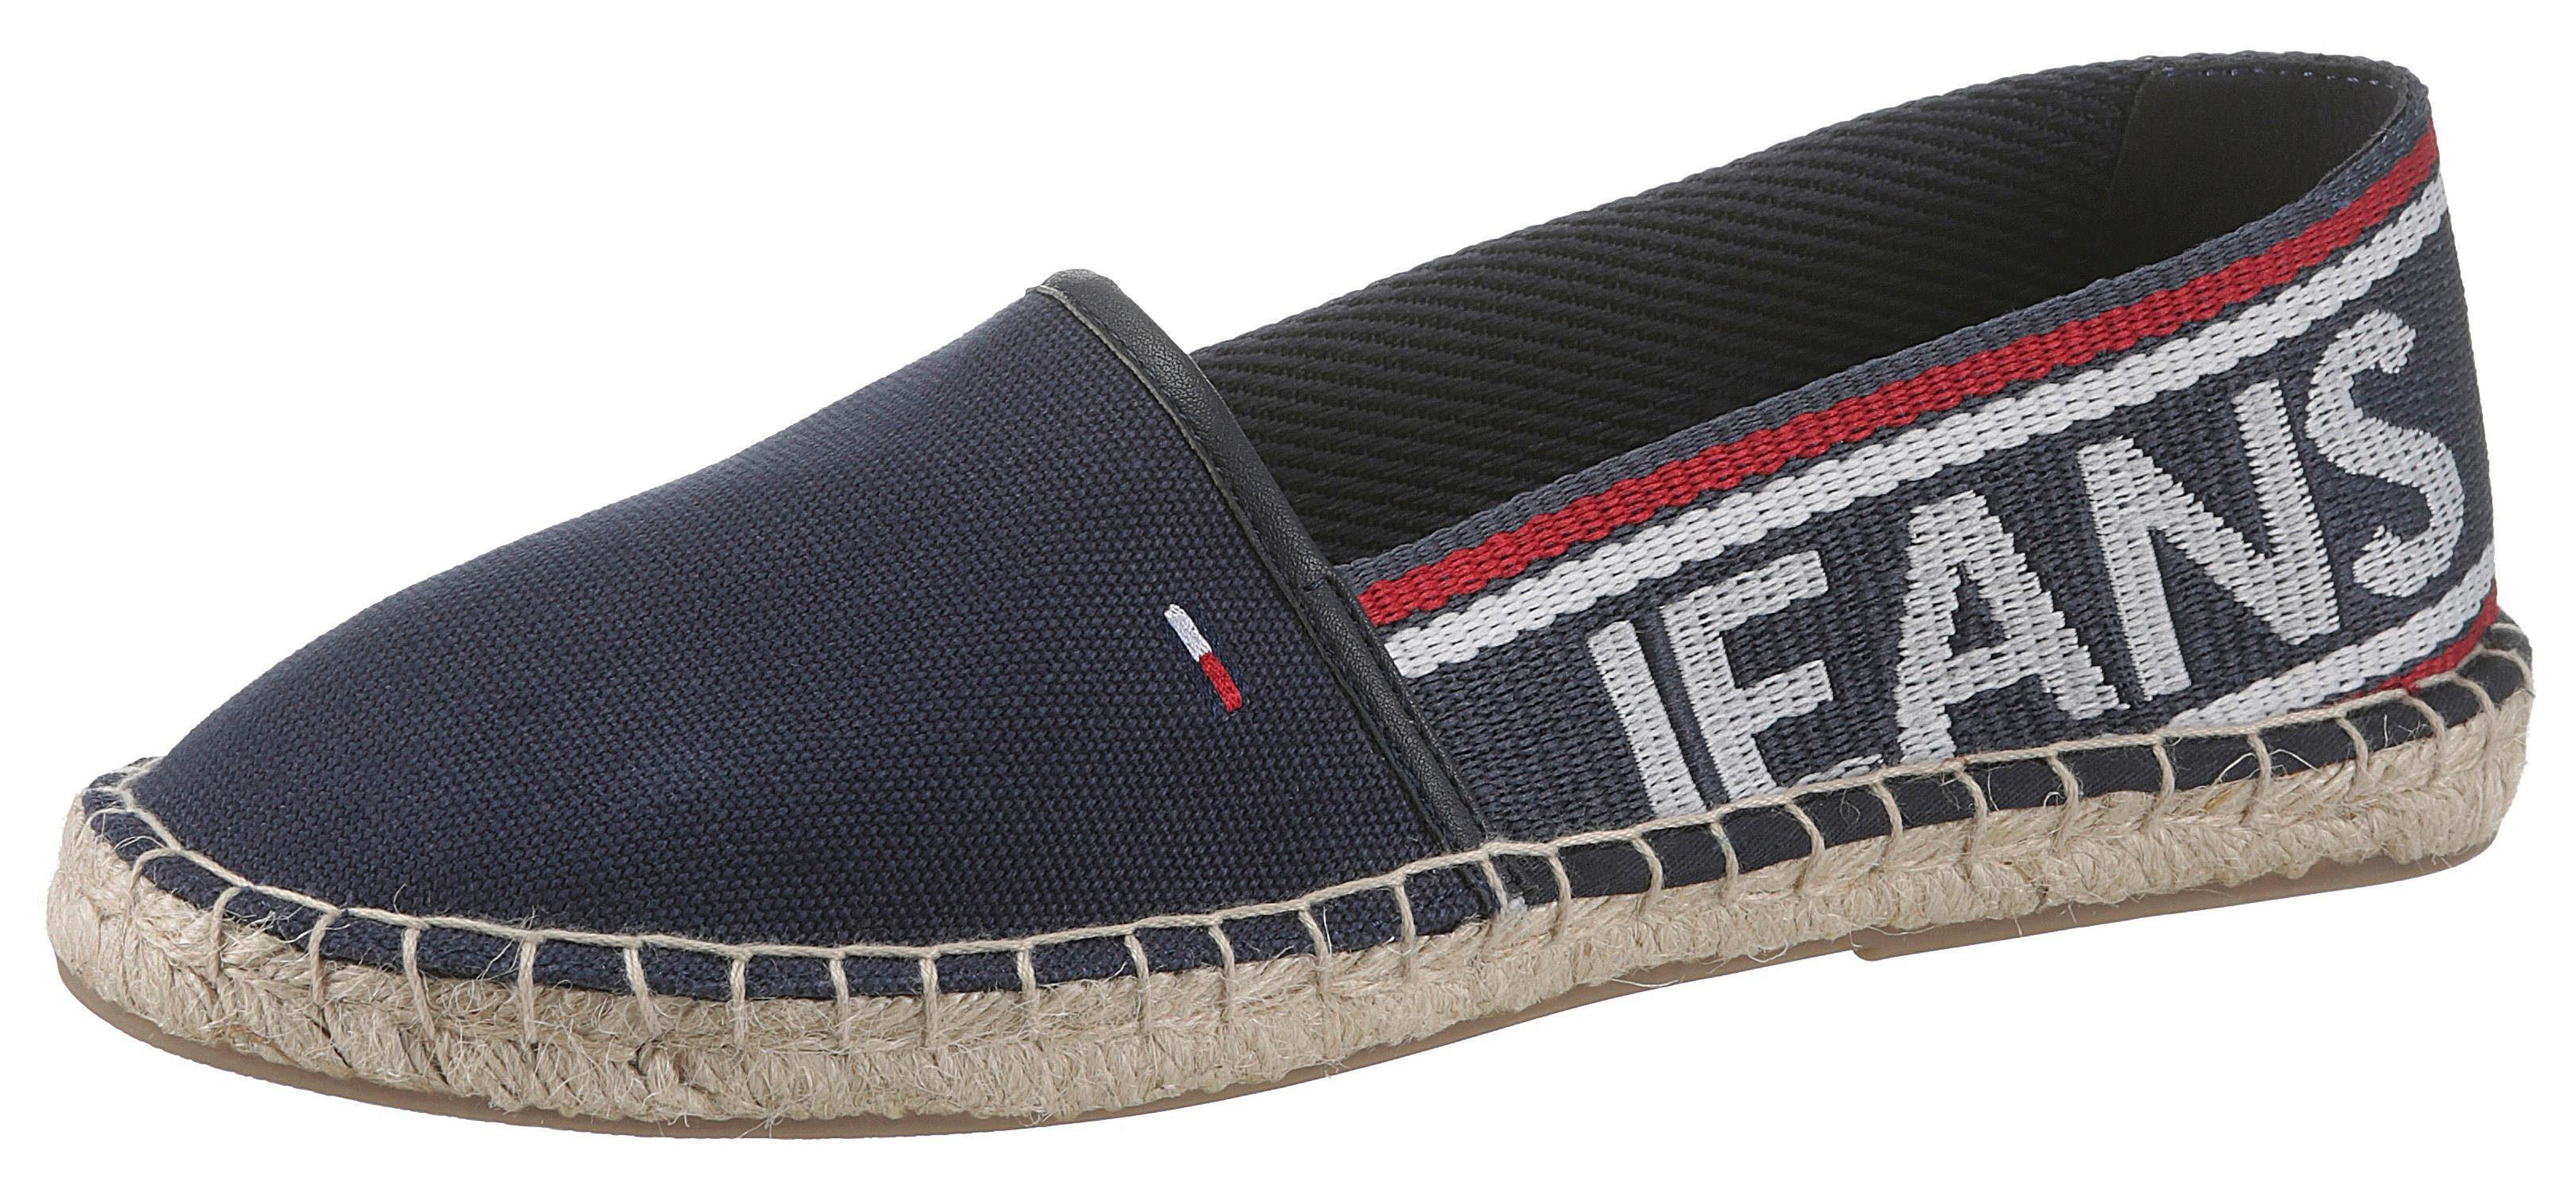 »selia KaufenOtto Jeans Mit Espadrille Tommy 4d« Laufsohle Jutebezogener Online gvIYfymb67